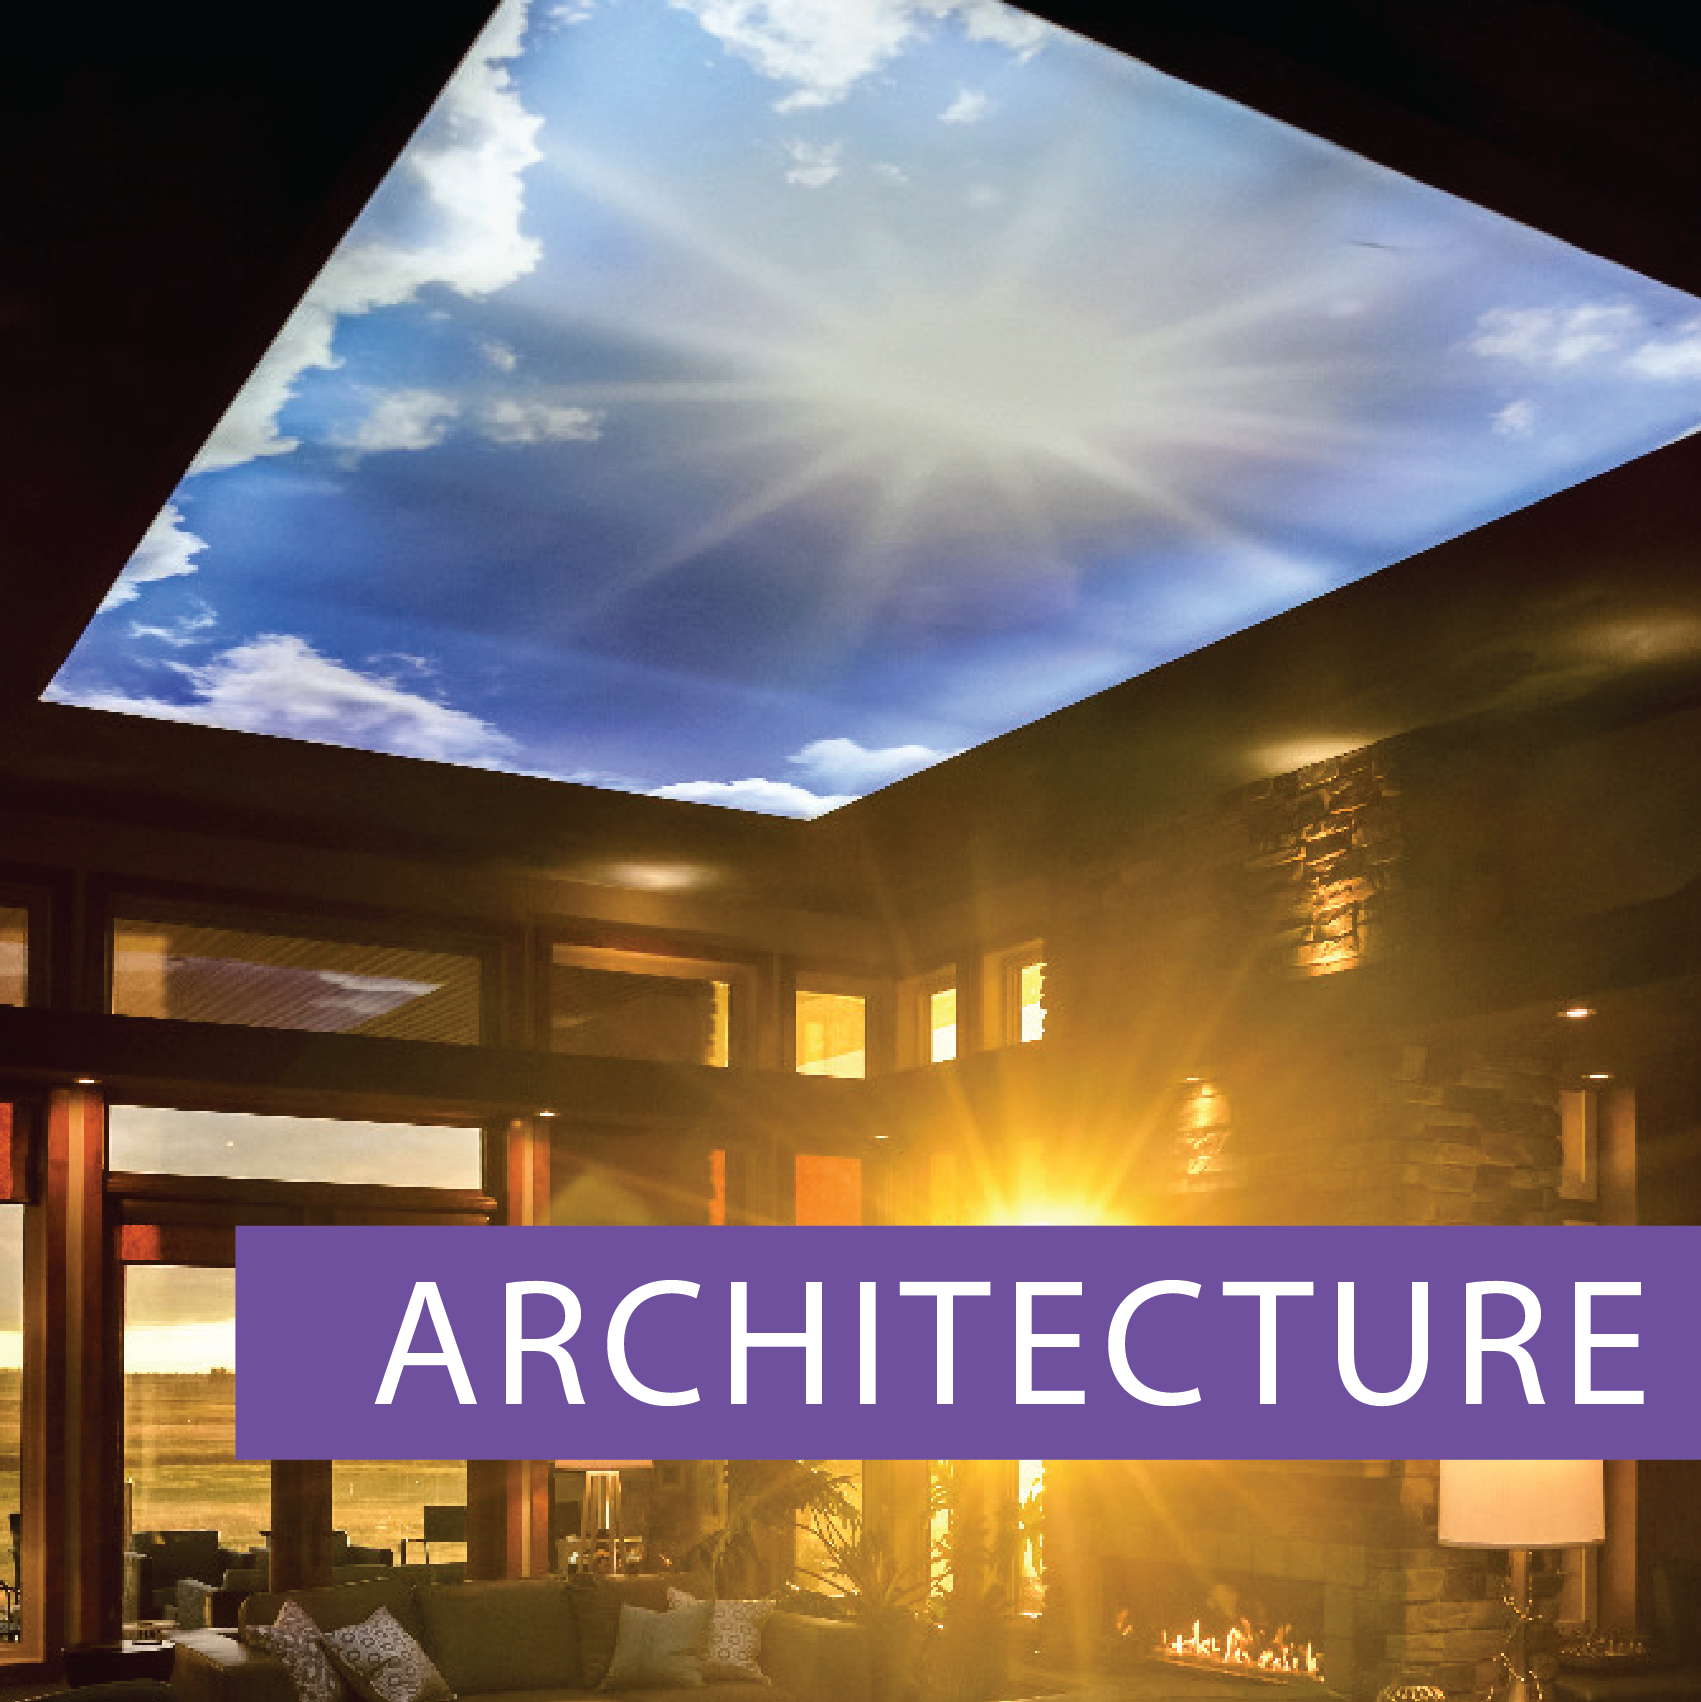 Architectural Matrix frame